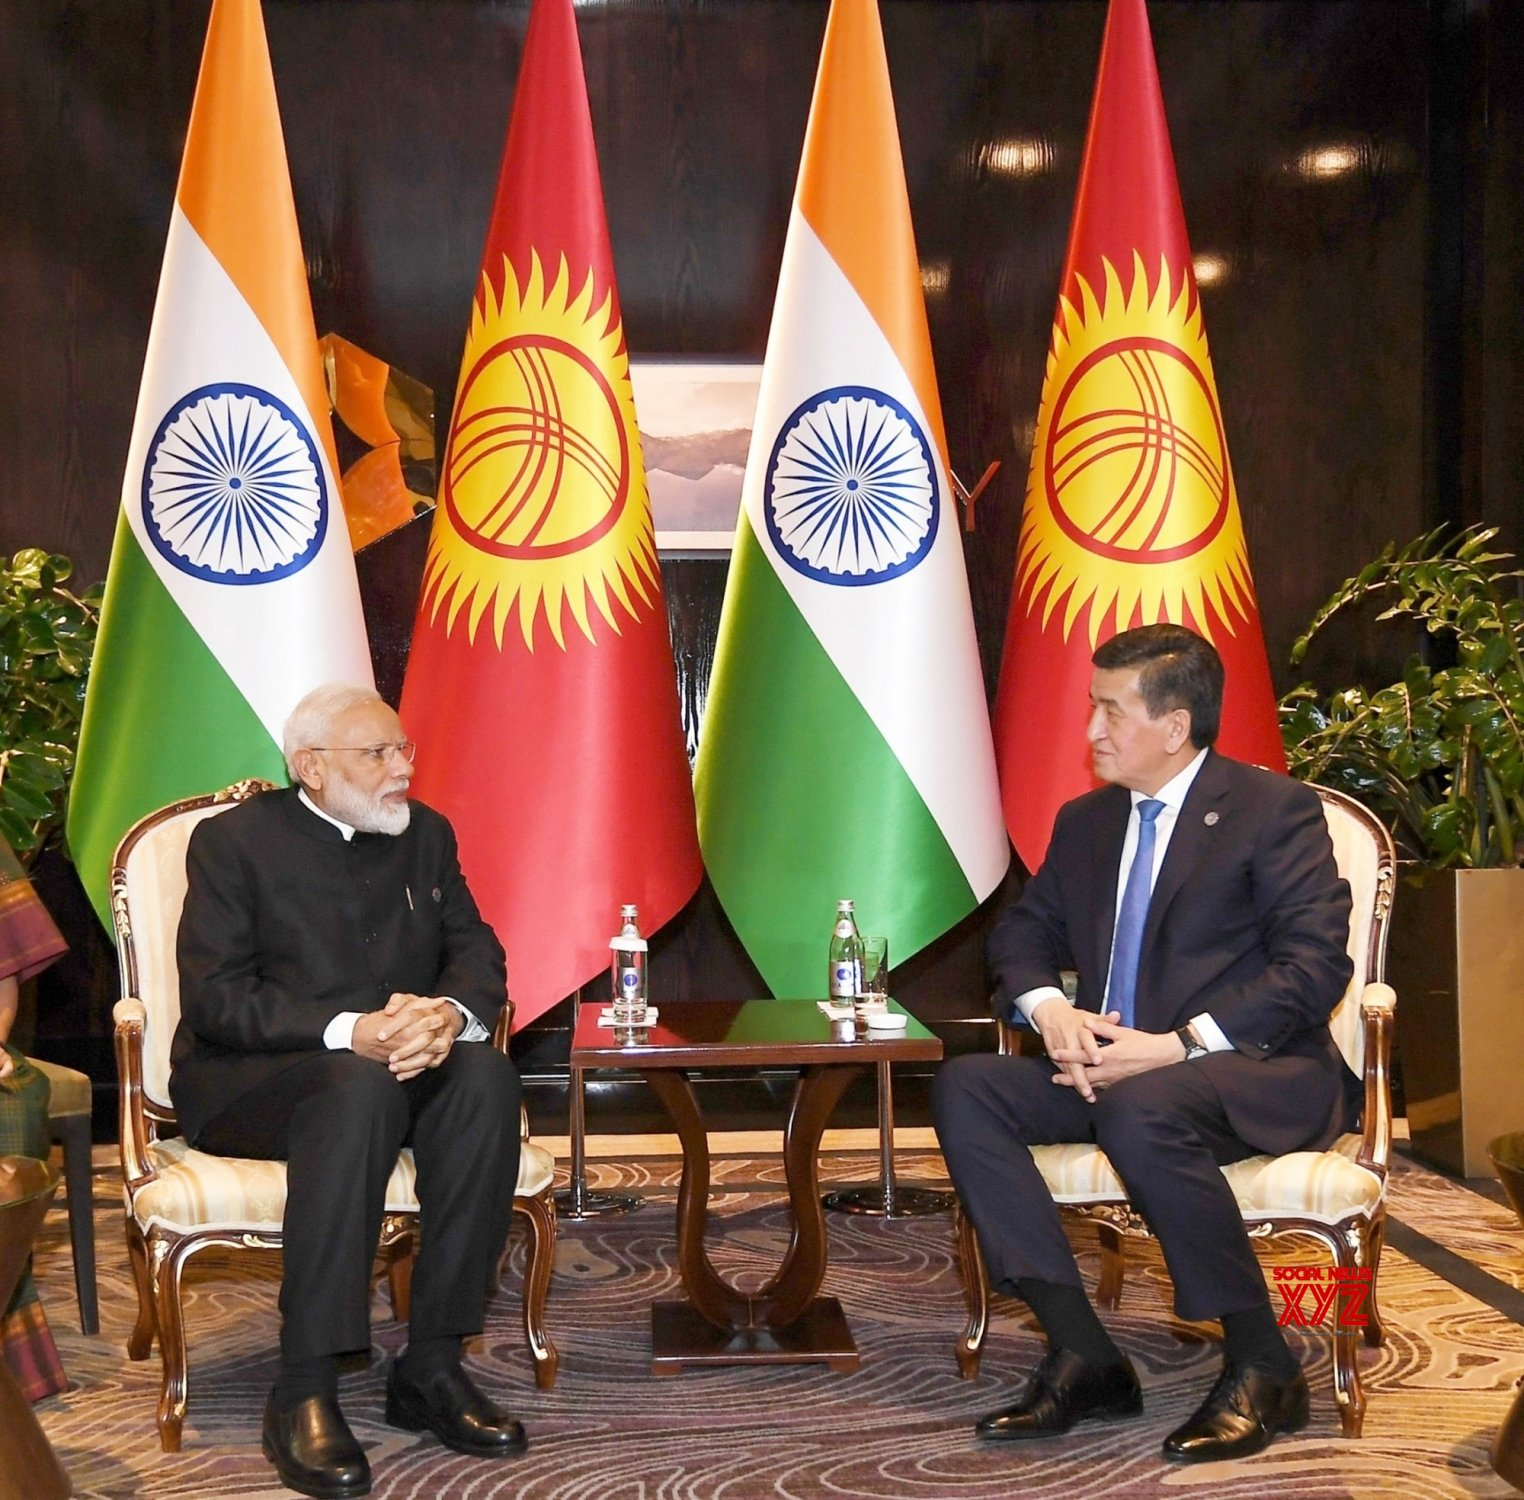 Bishkek (Kyrgyzstan): PM Modi meets Kyrgyzstan President #Gallery